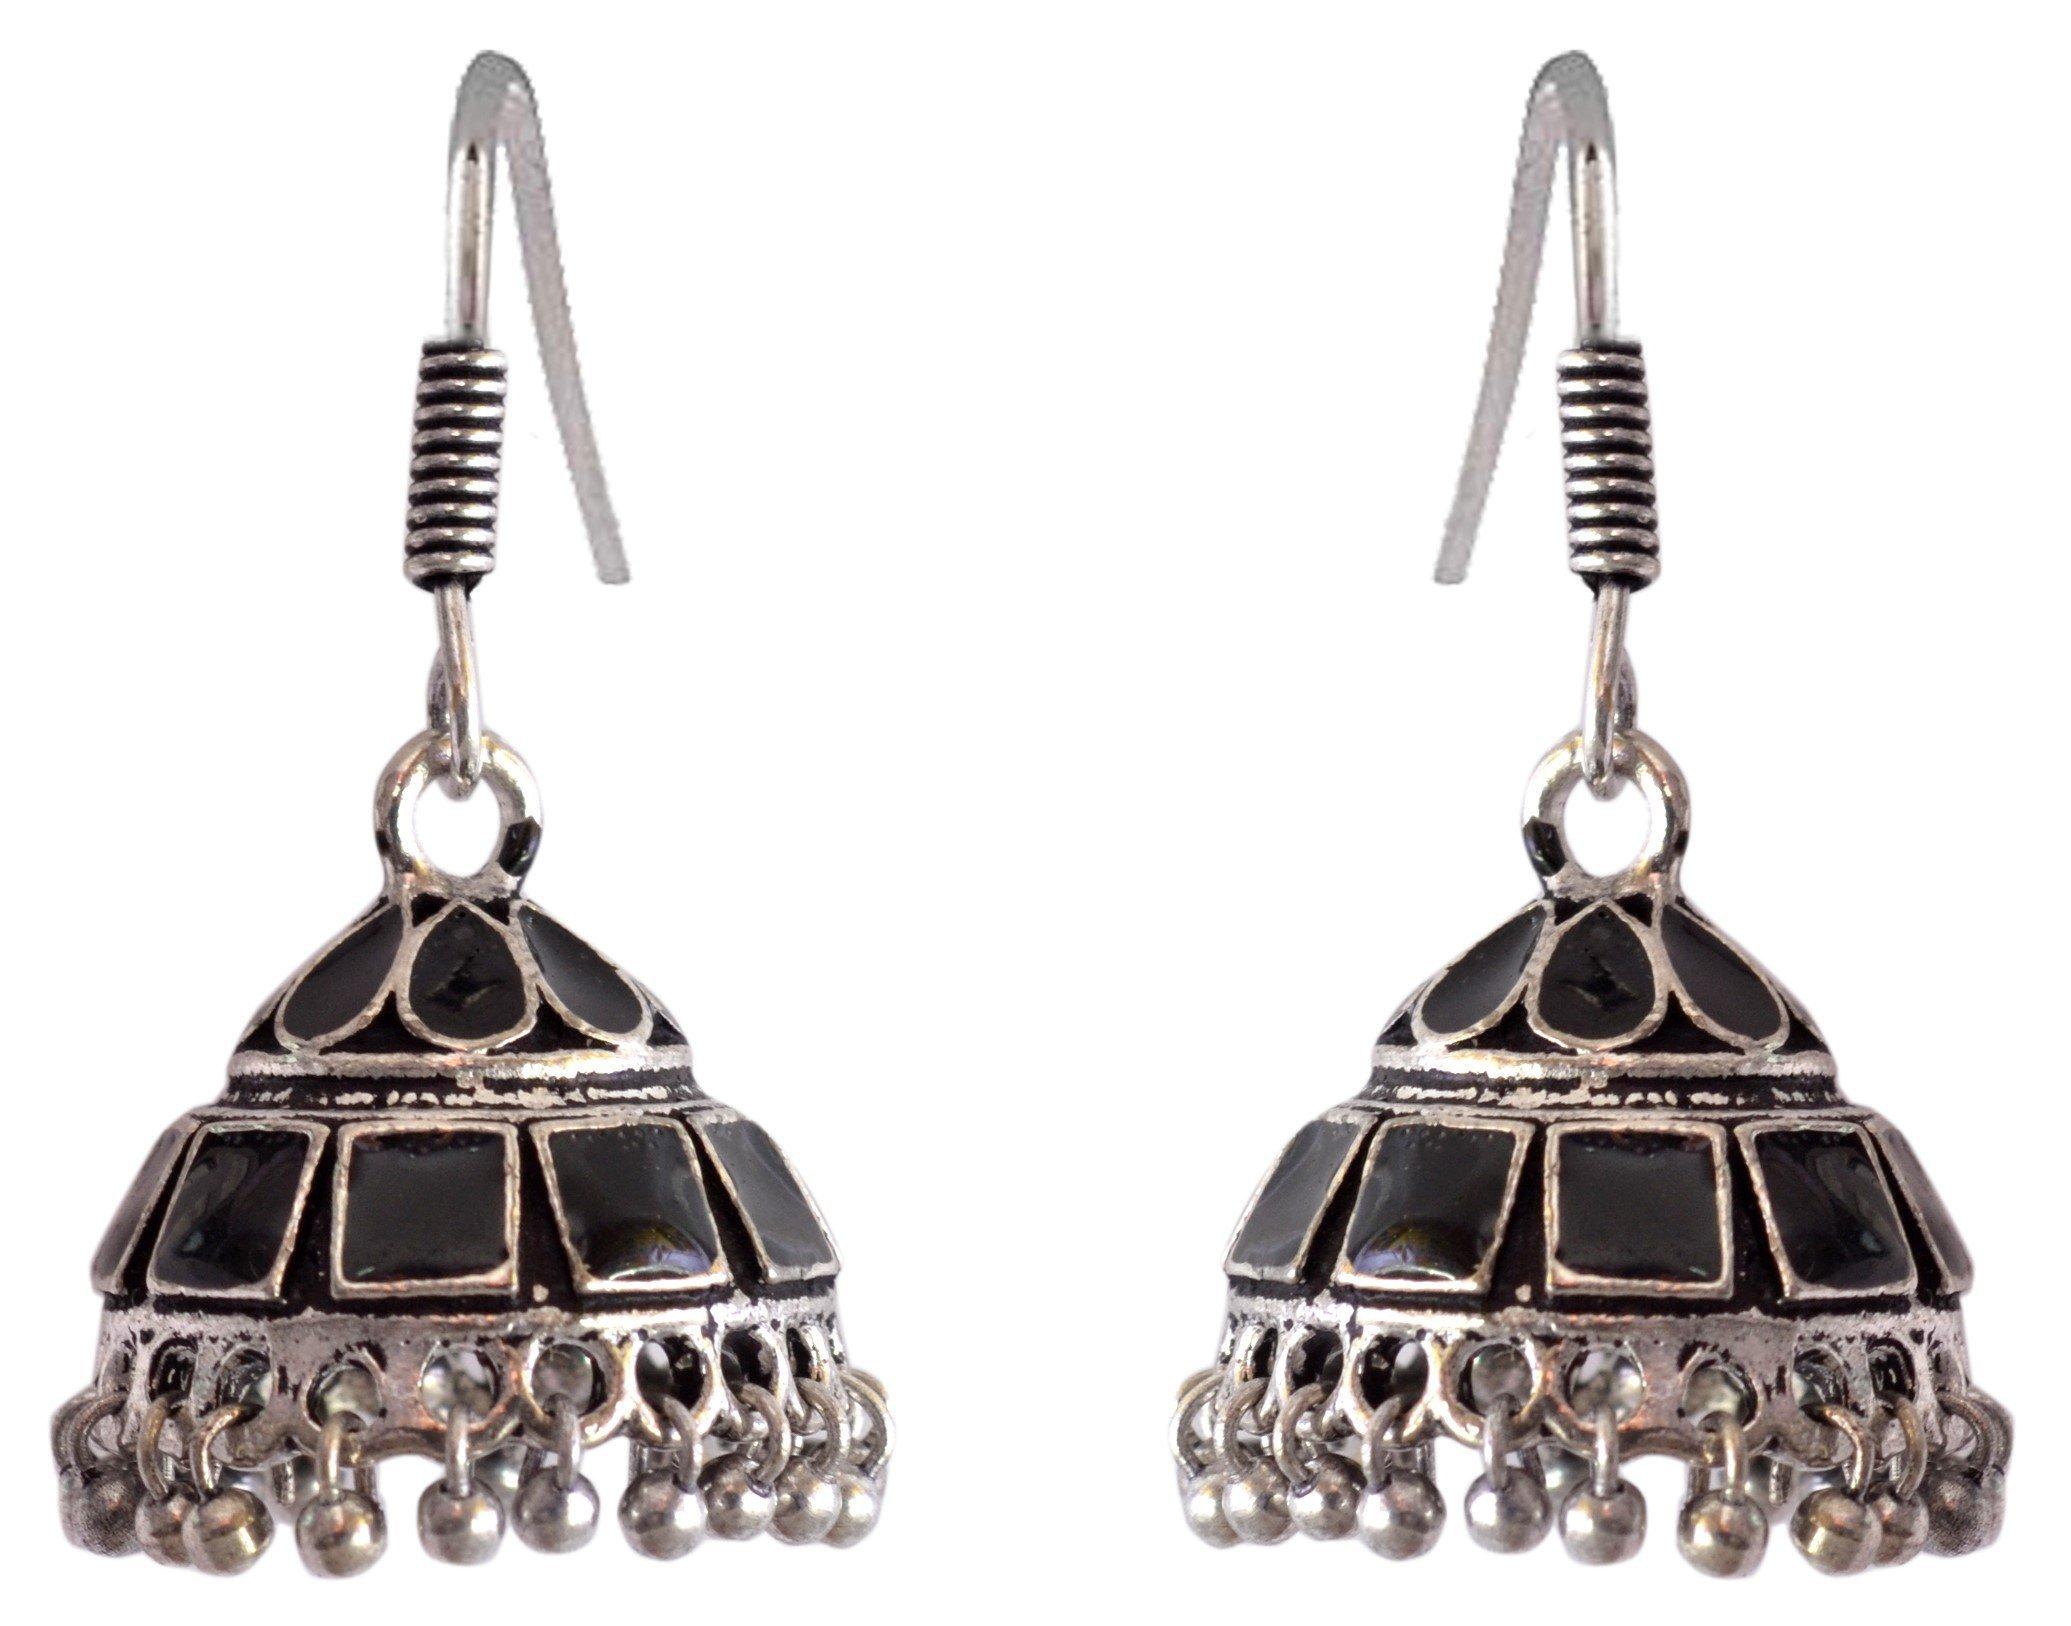 Sansar India Enamel Lightweight Jhumka Indian Earrings Jewelry for Girls and Women 1385